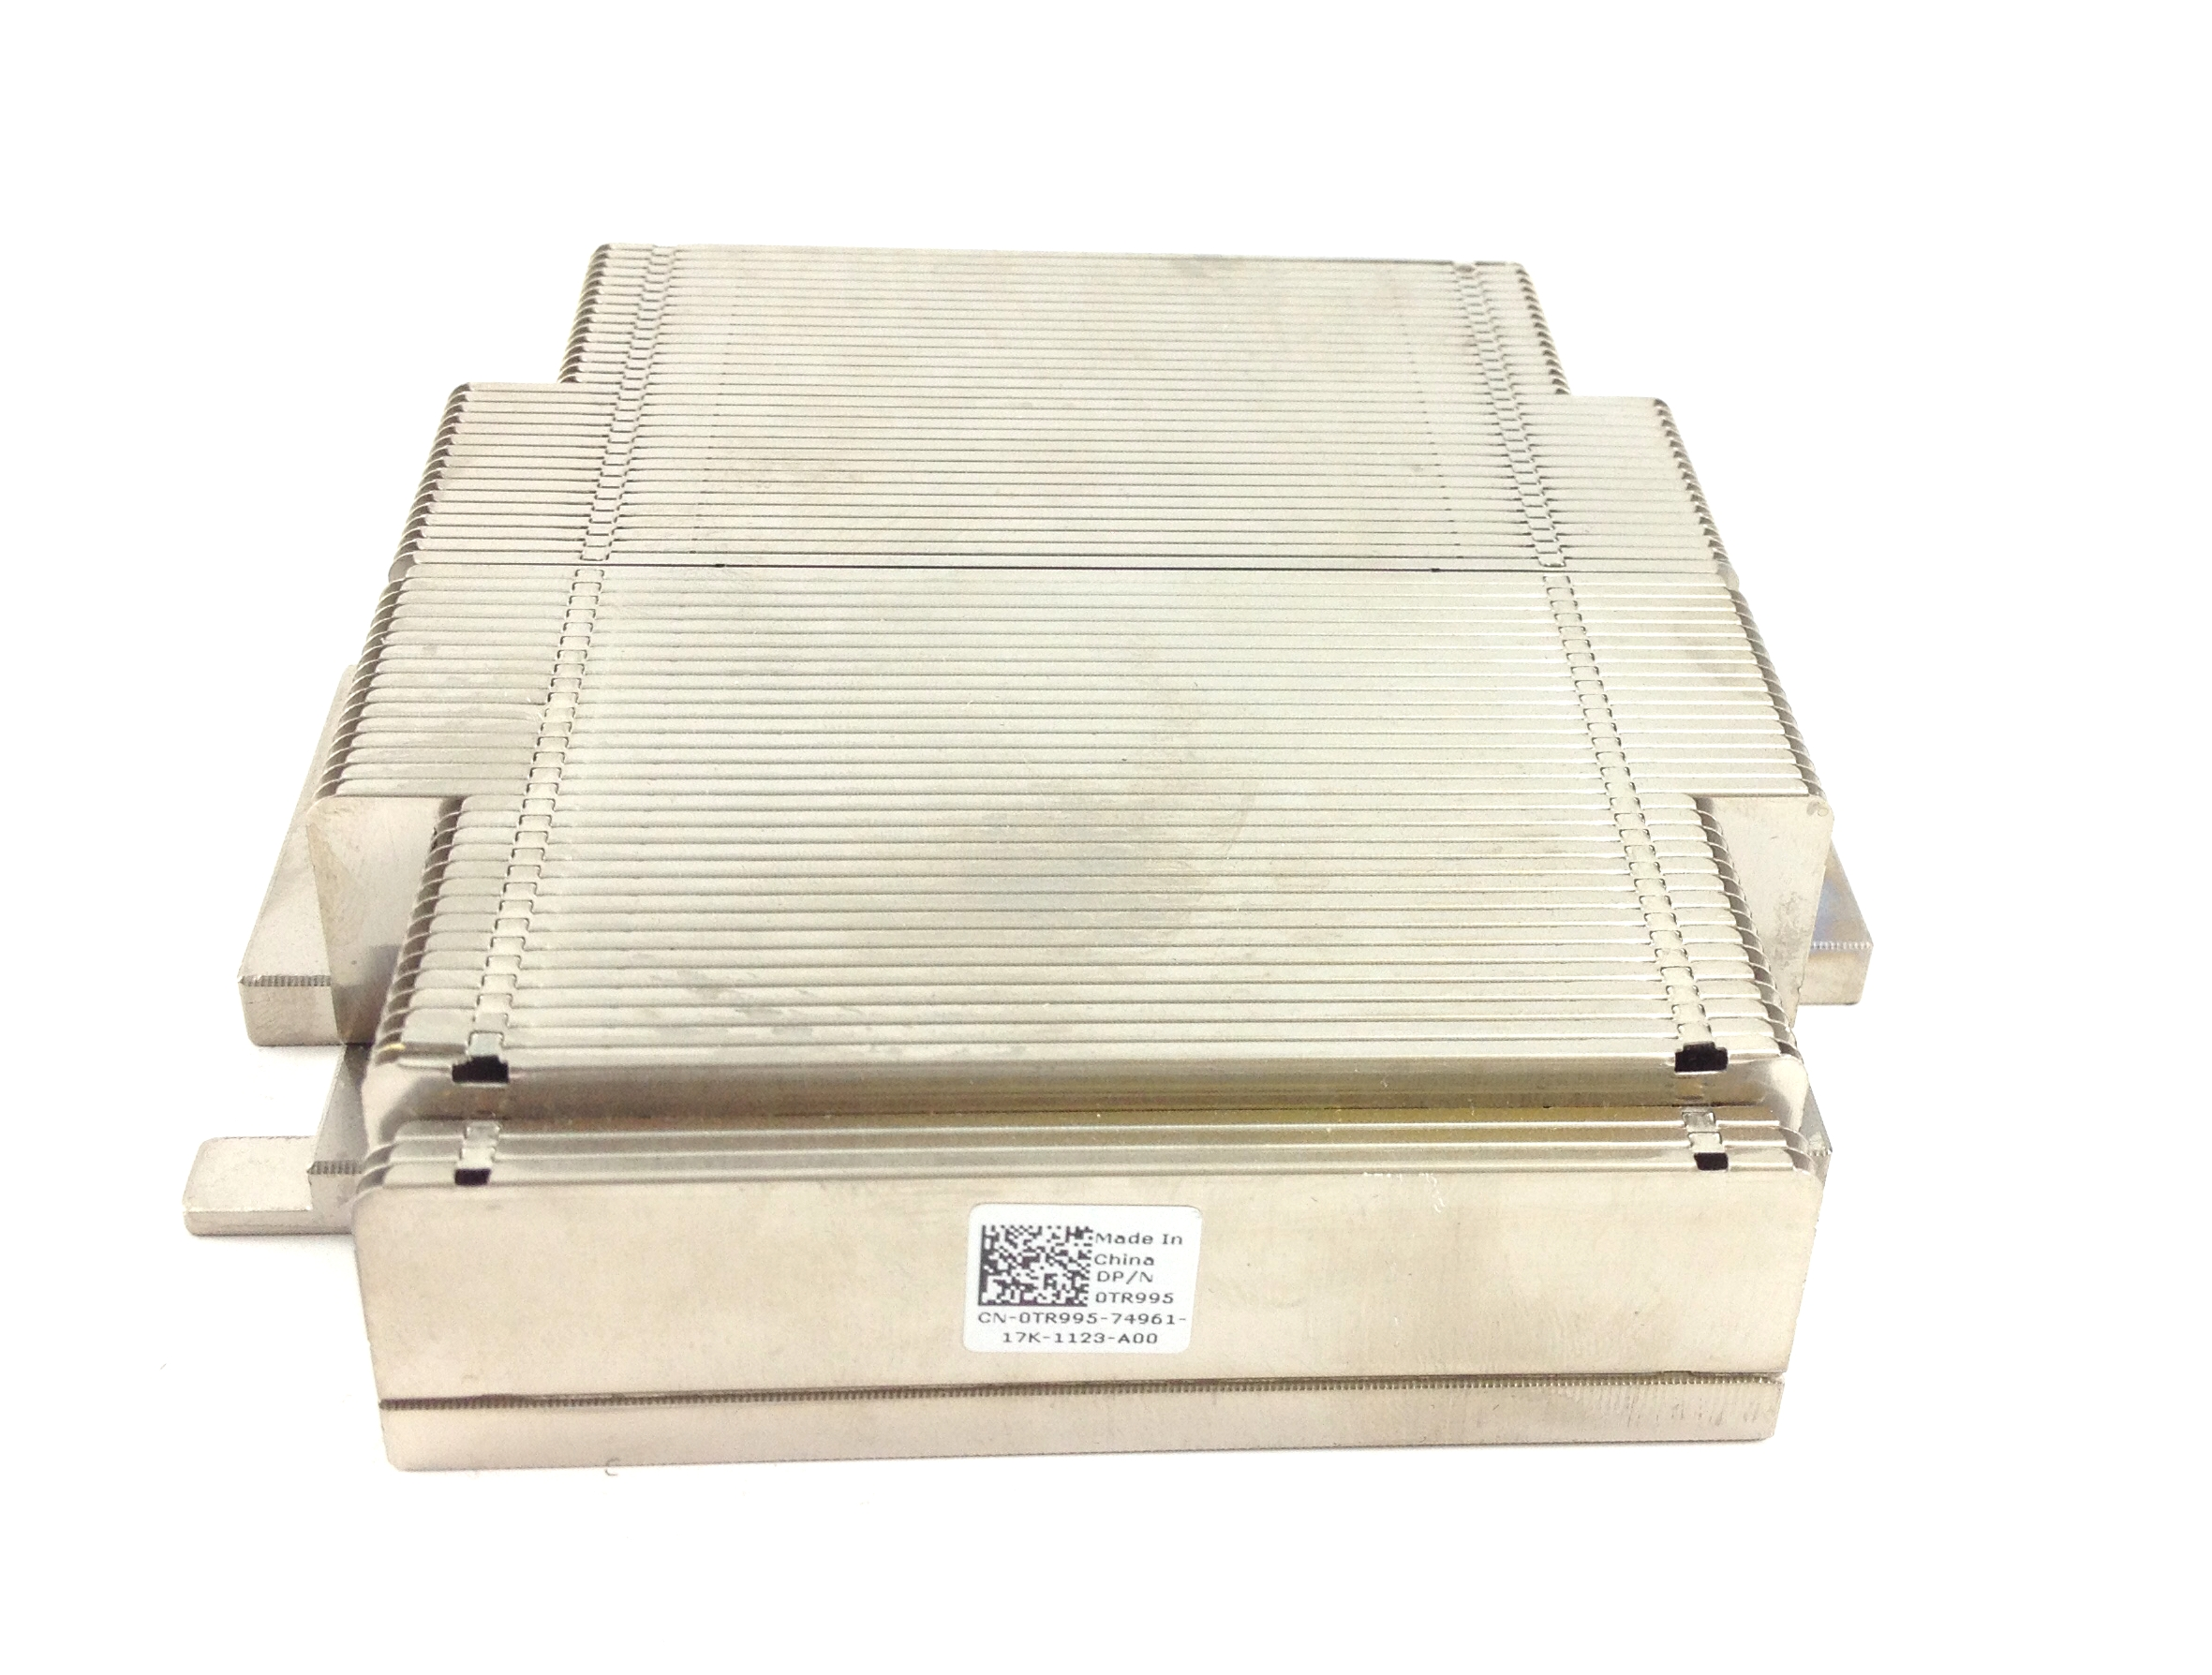 Dell PowerEdge R610 CPU Heatsink R610 Heatsink (TR995)